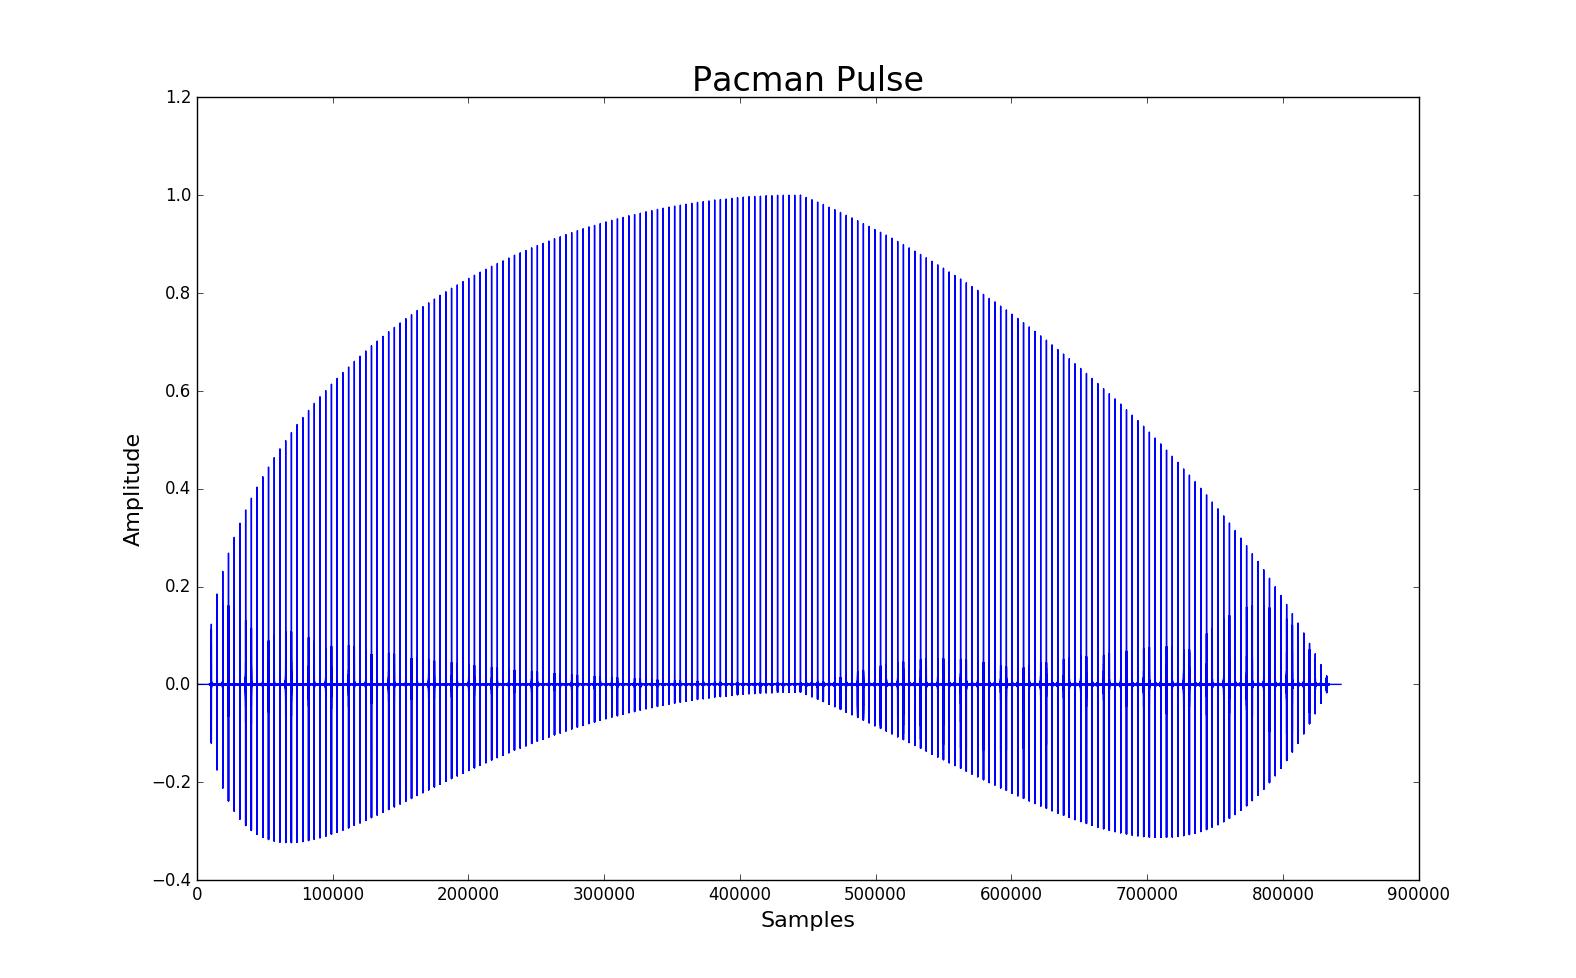 Pacman Pulse